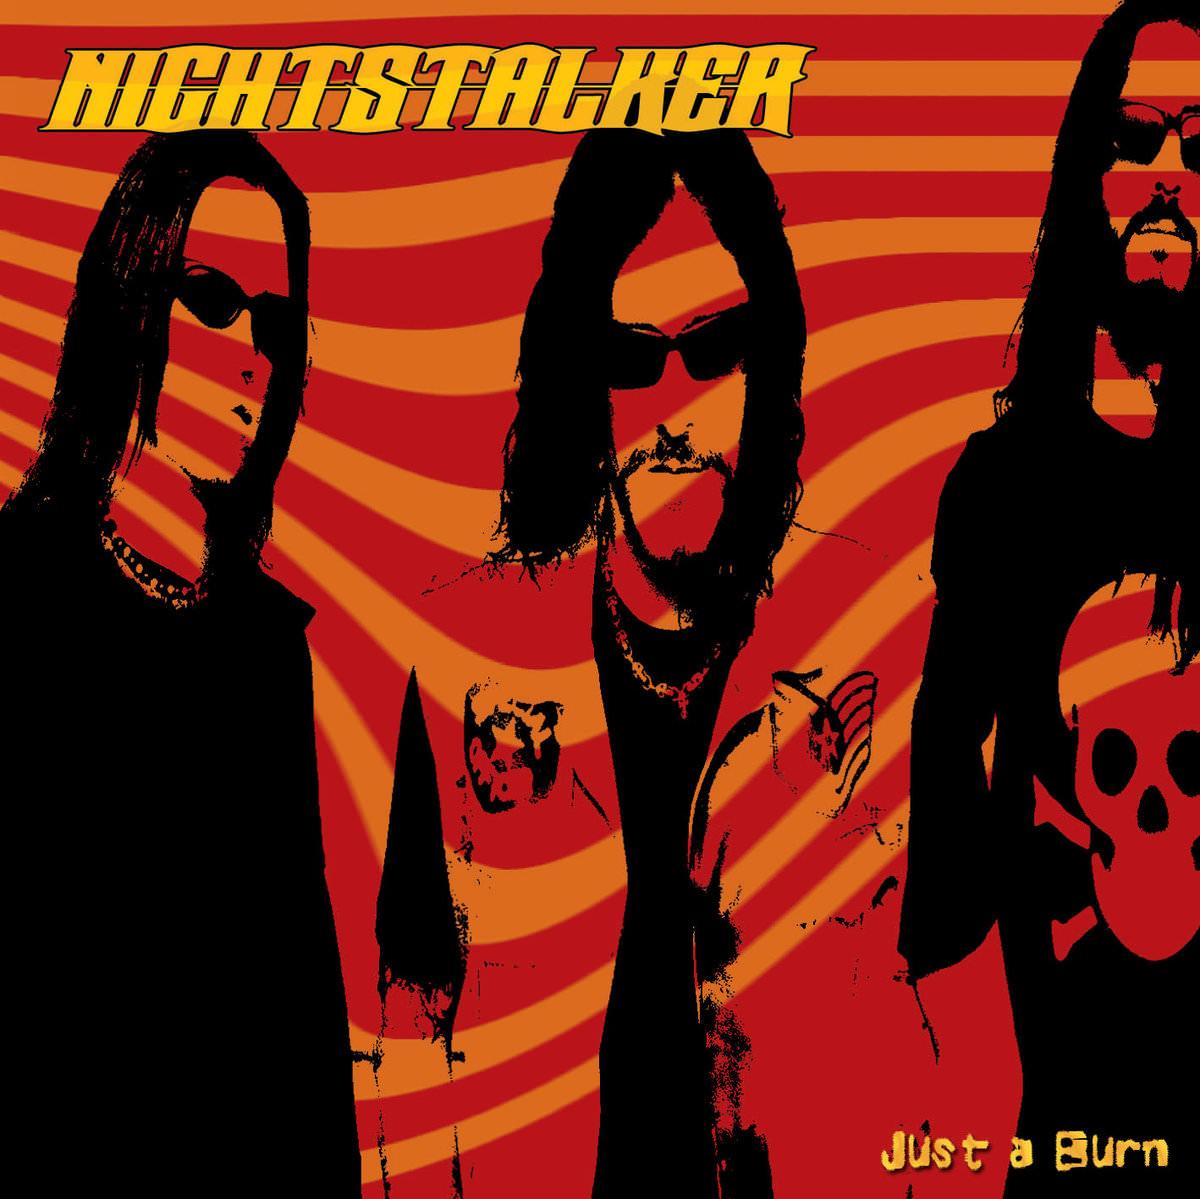 nightstalker-just-a-burn